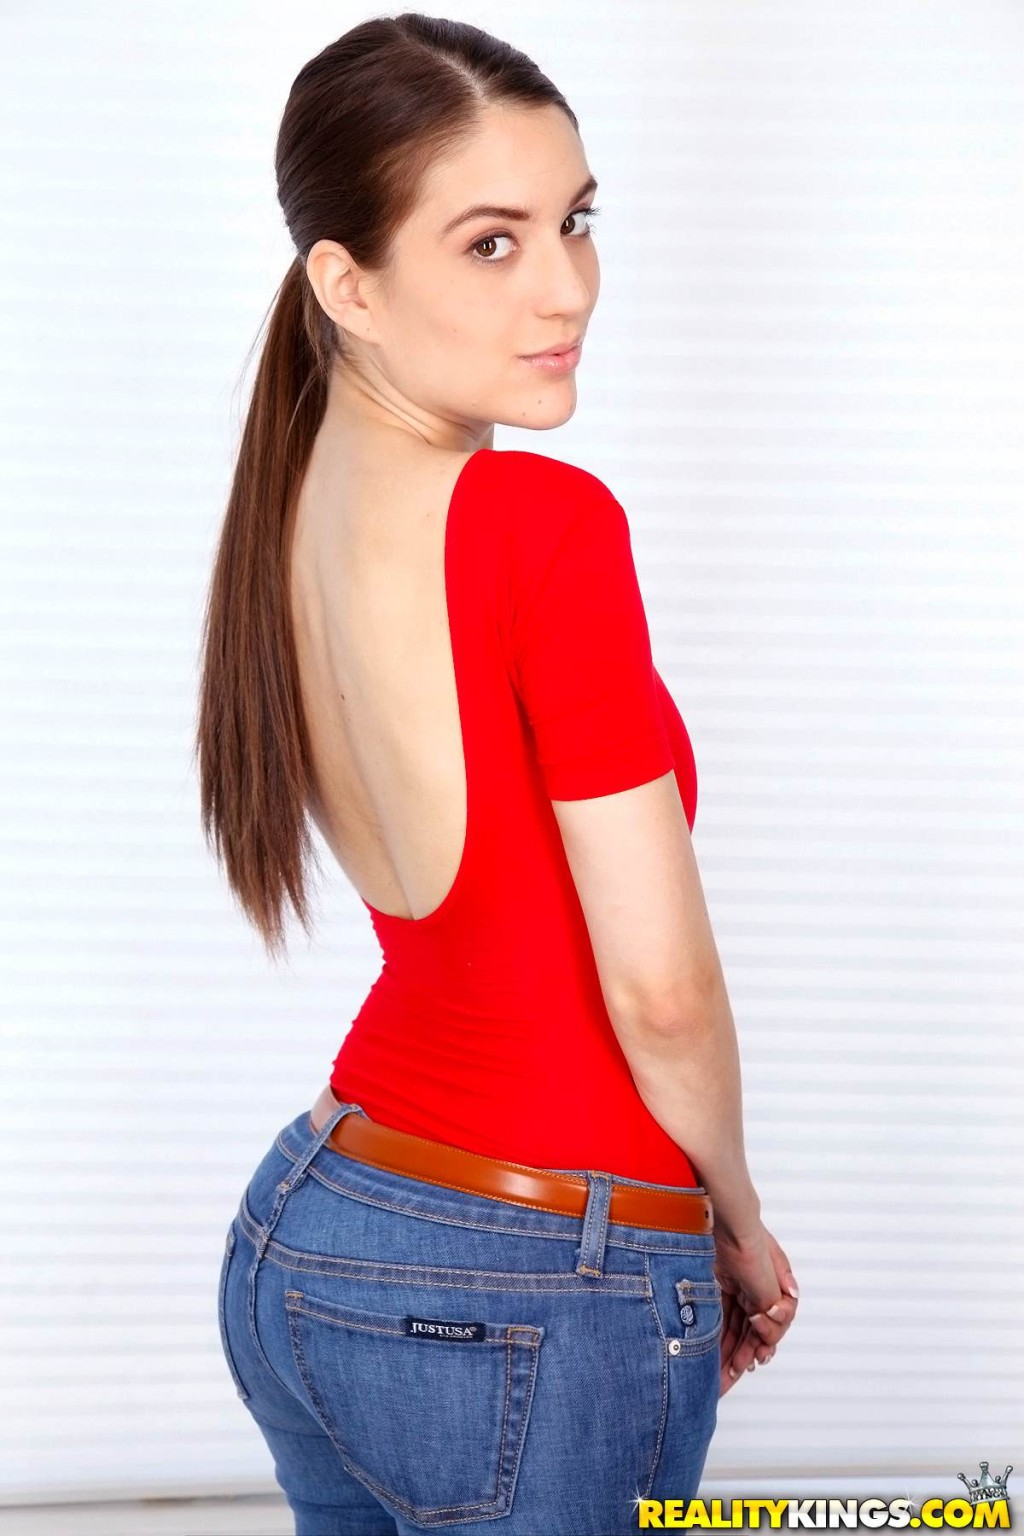 Adolescent zarena summers rough dug in her rectal opening